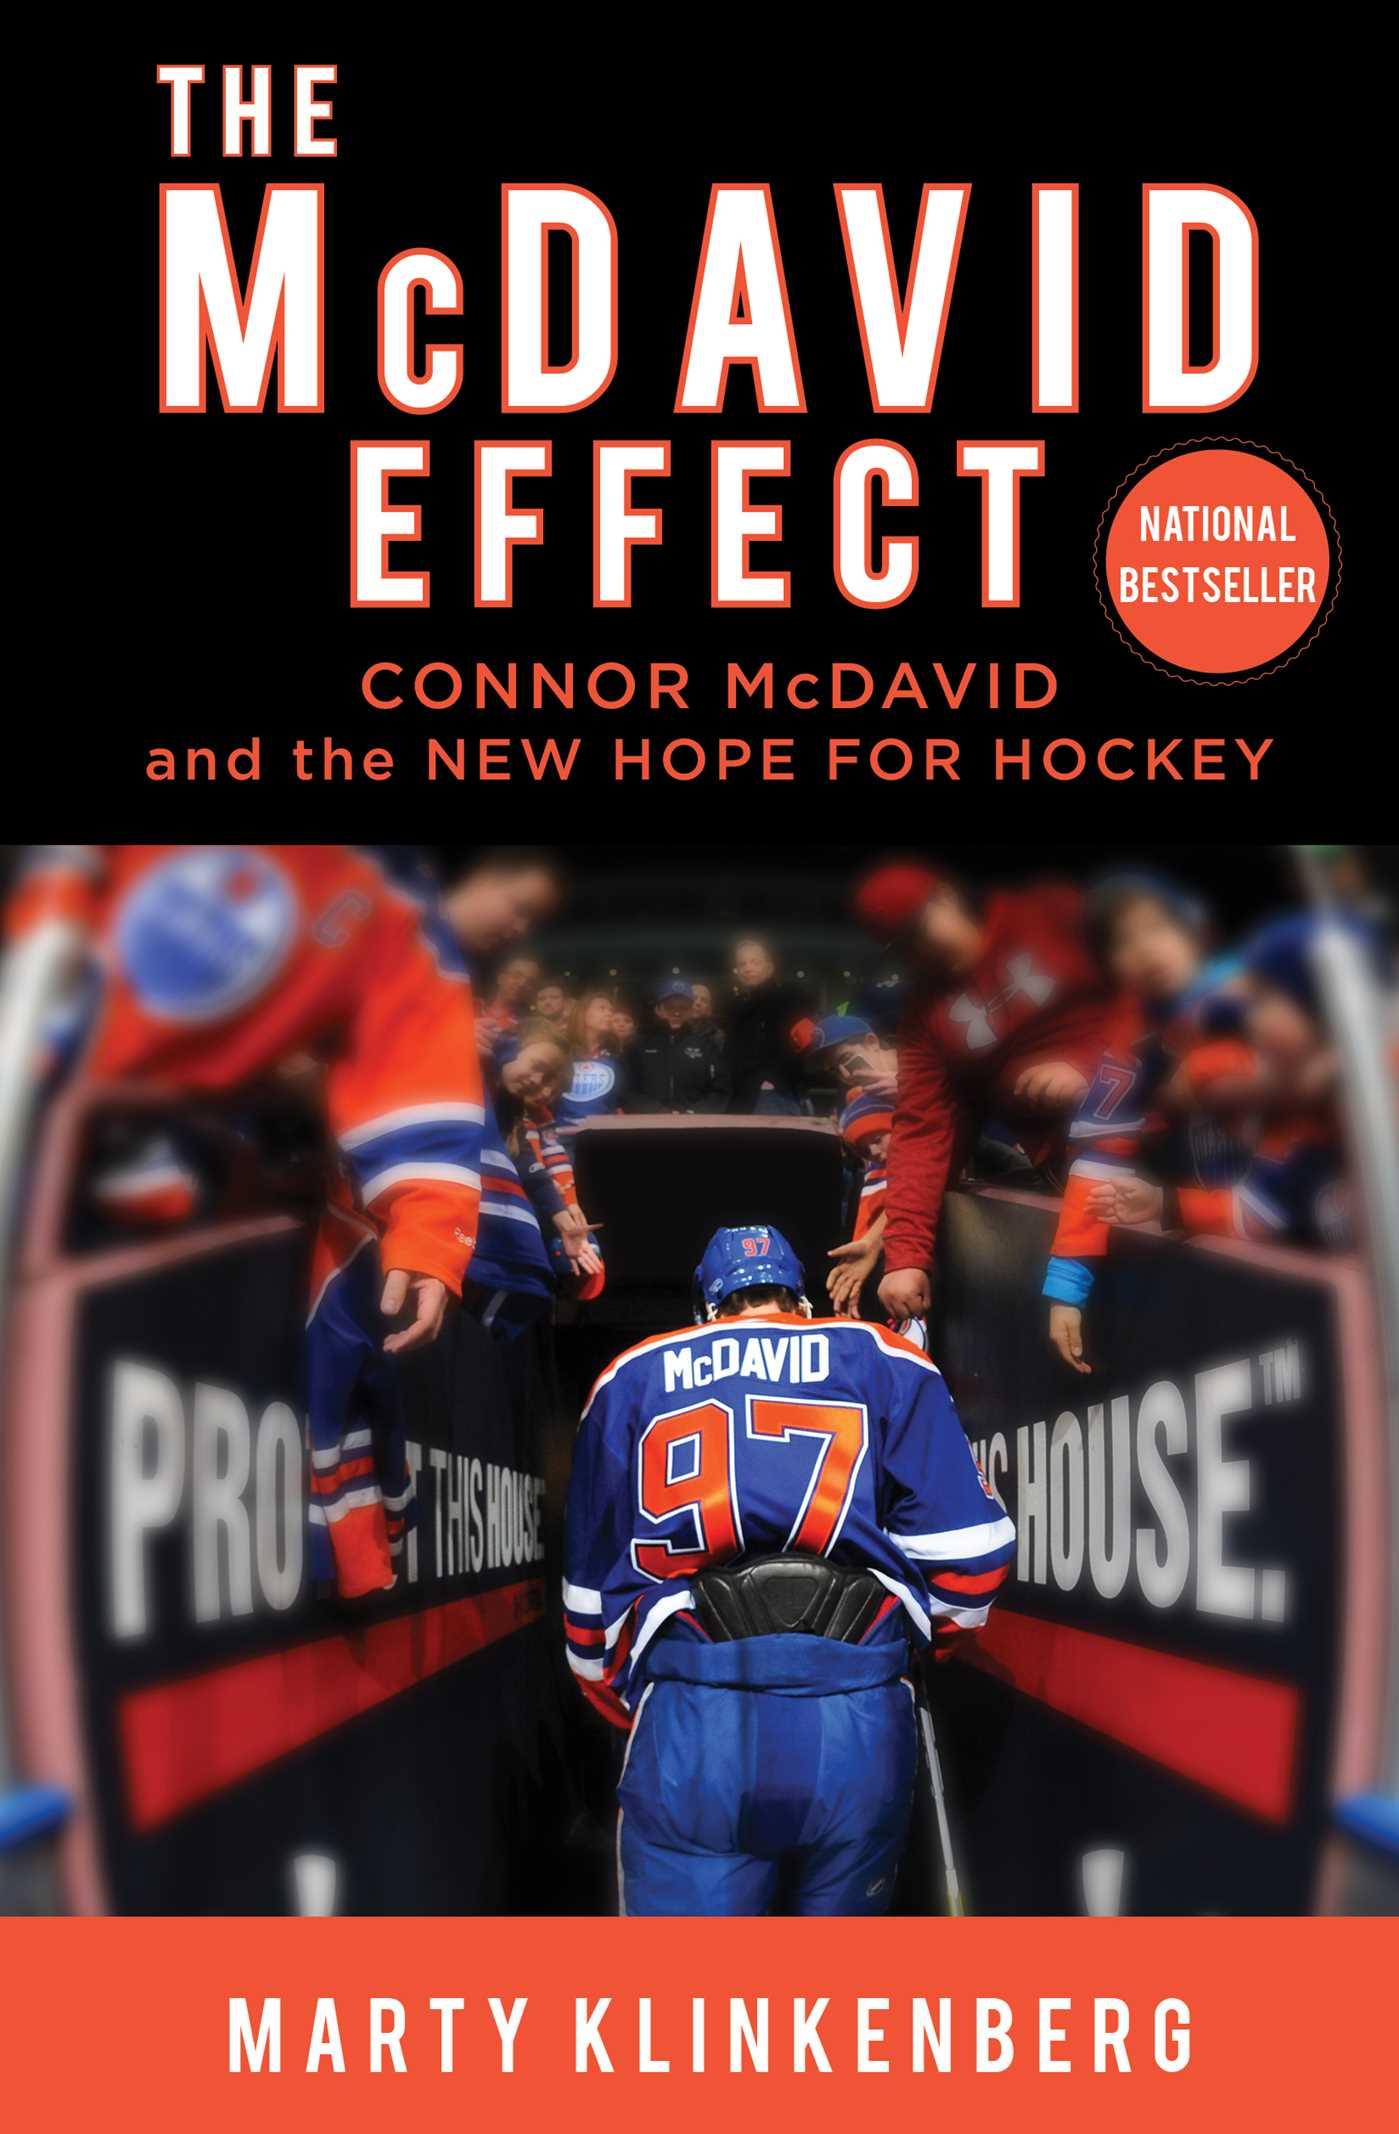 The mcdavid effect 9781501146046 hr